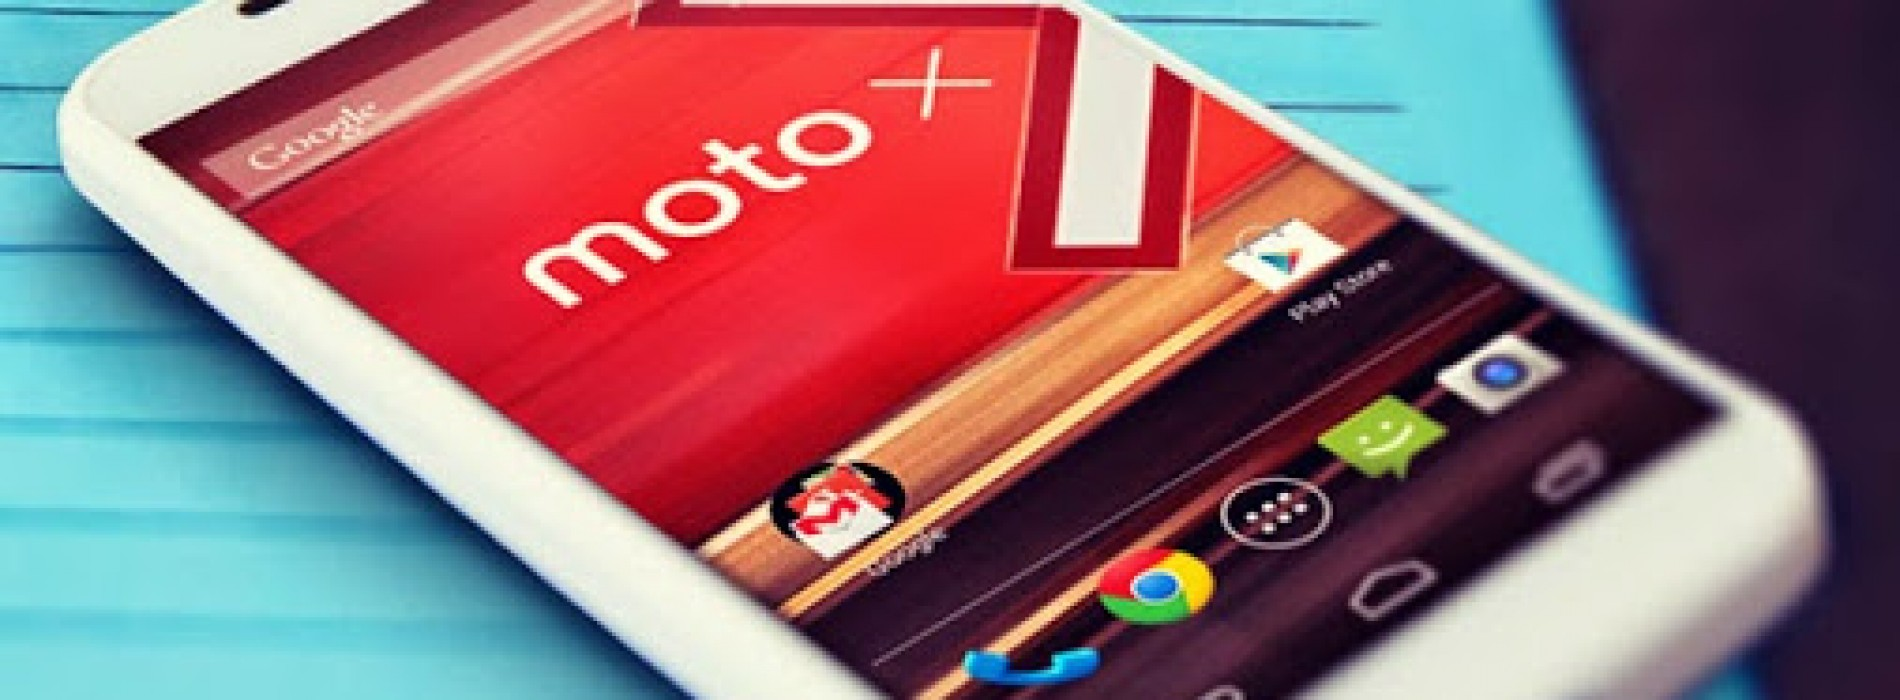 Back-to-school: Motorola slashes Moto X prices yet again